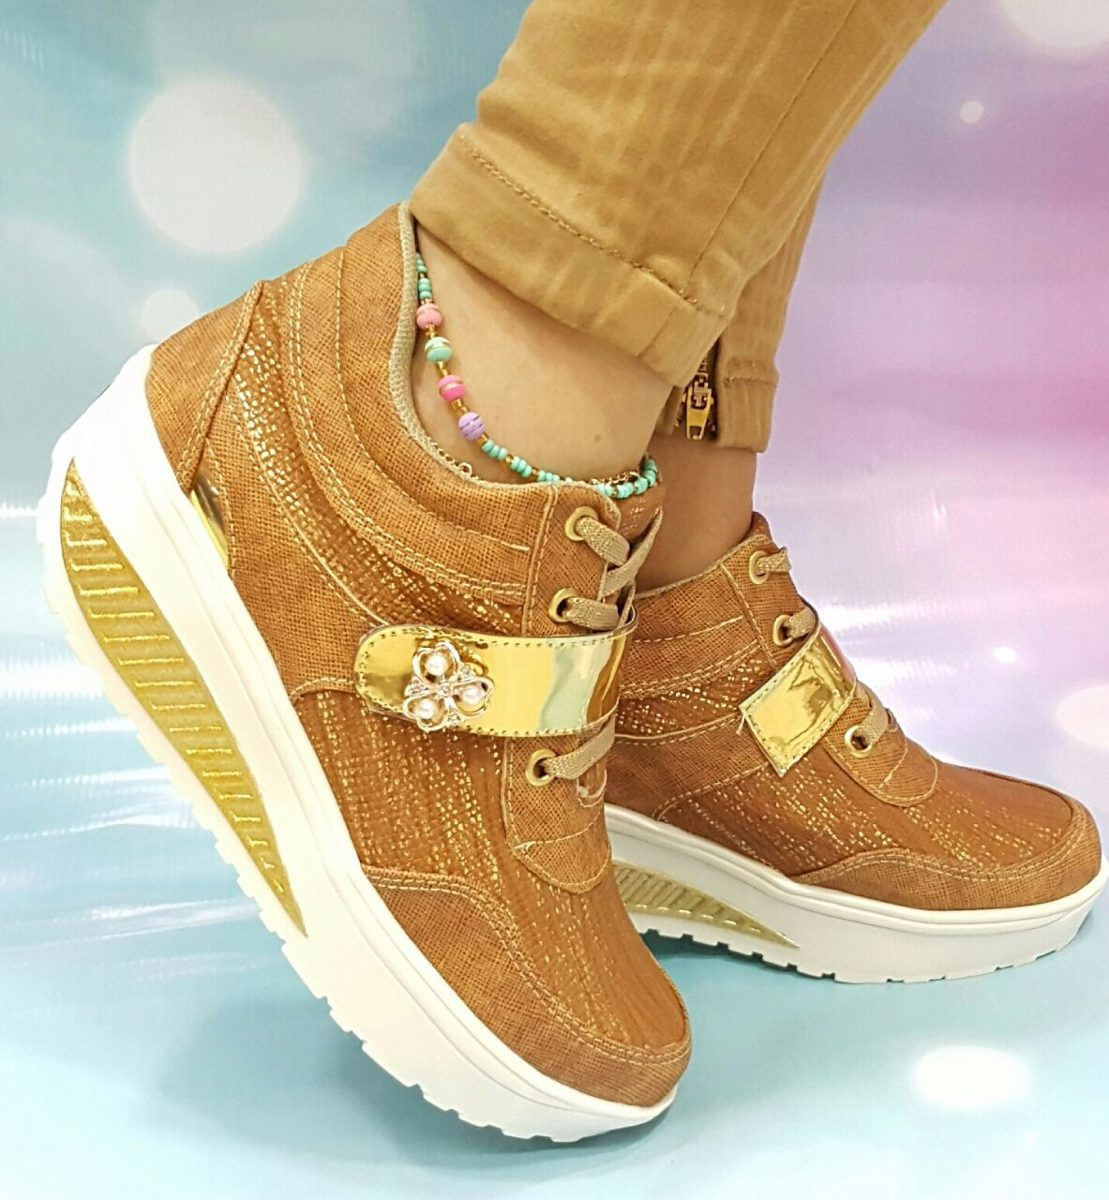 c8b2d47a Calzado Miel Tendencia En Colombia Moda Zapatos Dama Mujer ...